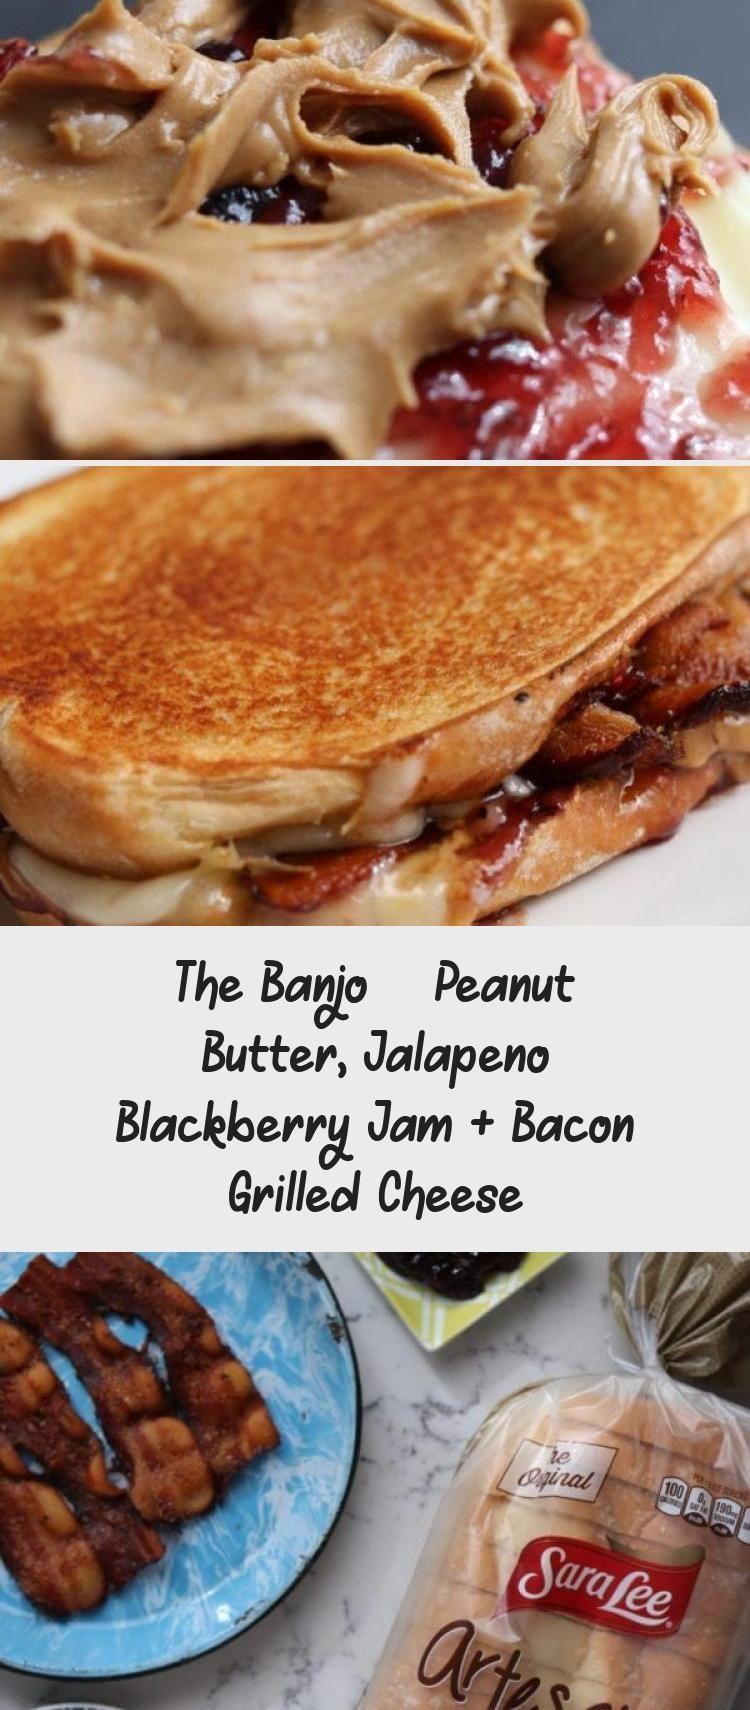 The Banjo Peanut Butter Jalapeno Blackberry Jam Bacon Grilled Cheese Sandwich Peanut Butter In 2020 Bacon Grilled Cheese Honey Roasted Peanuts Peanut Butter